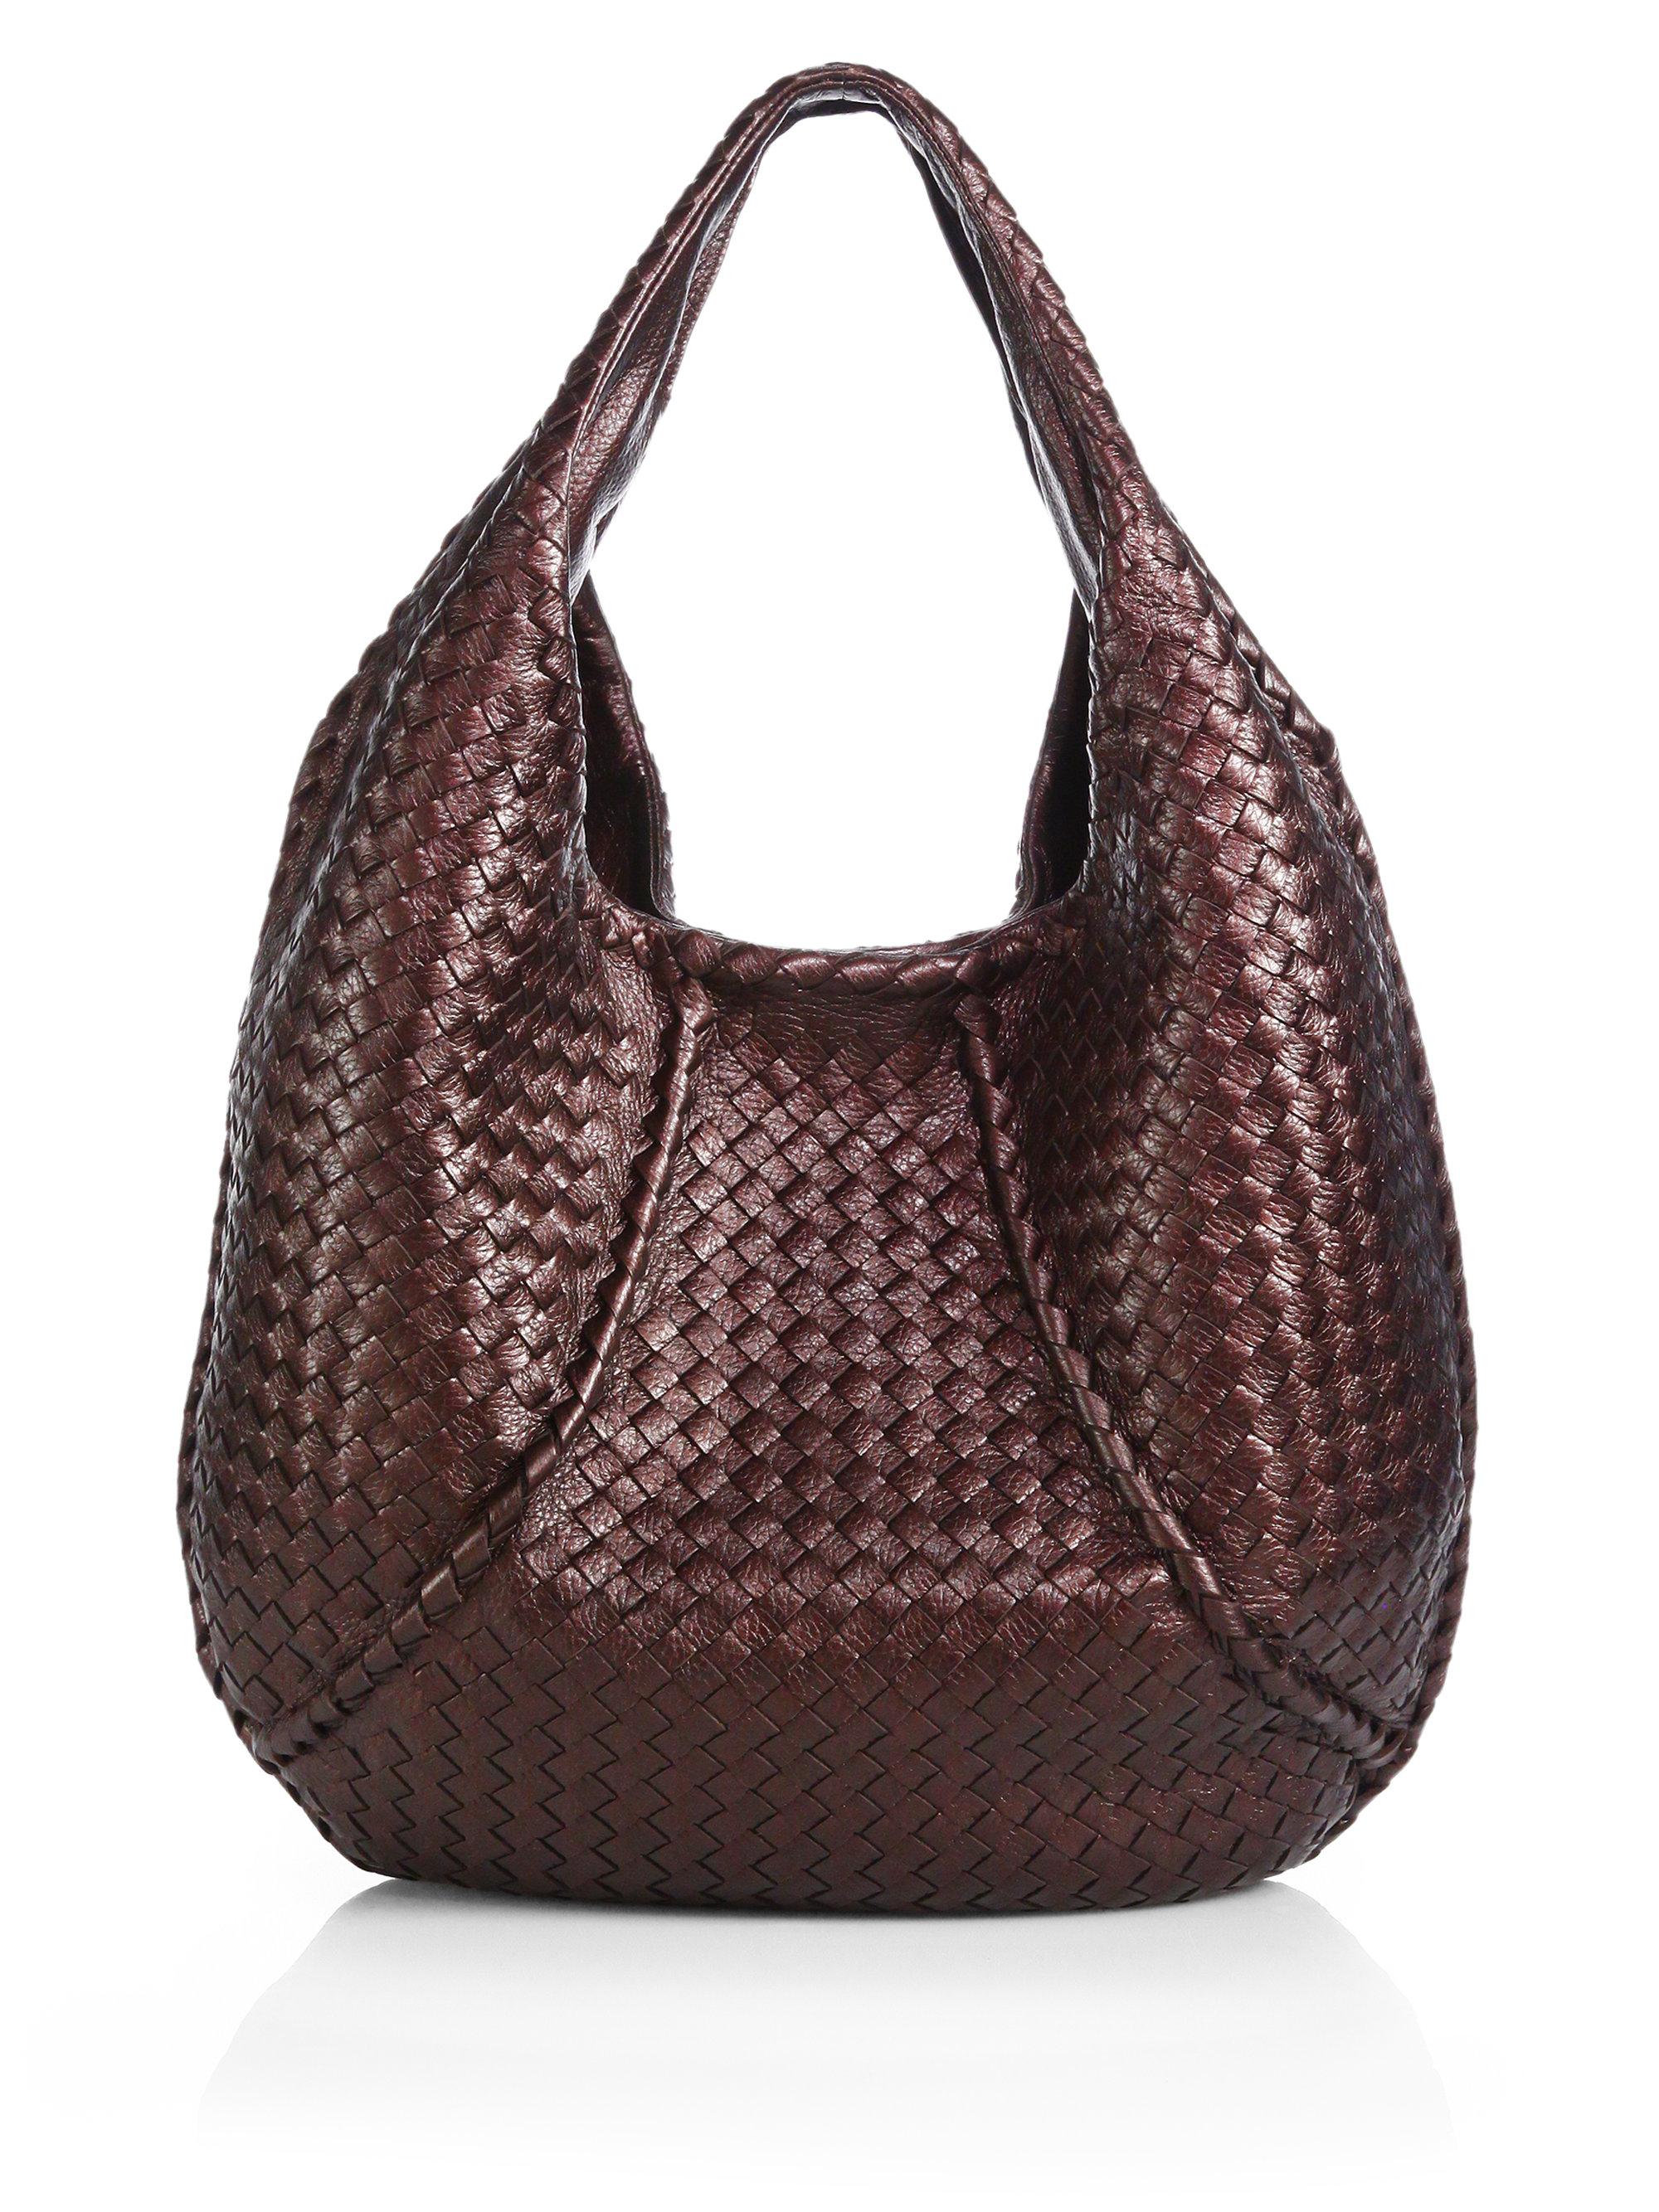 b3ee1cc06037 Lyst - Bottega Veneta Metallic Woven Leather Hobo in Brown